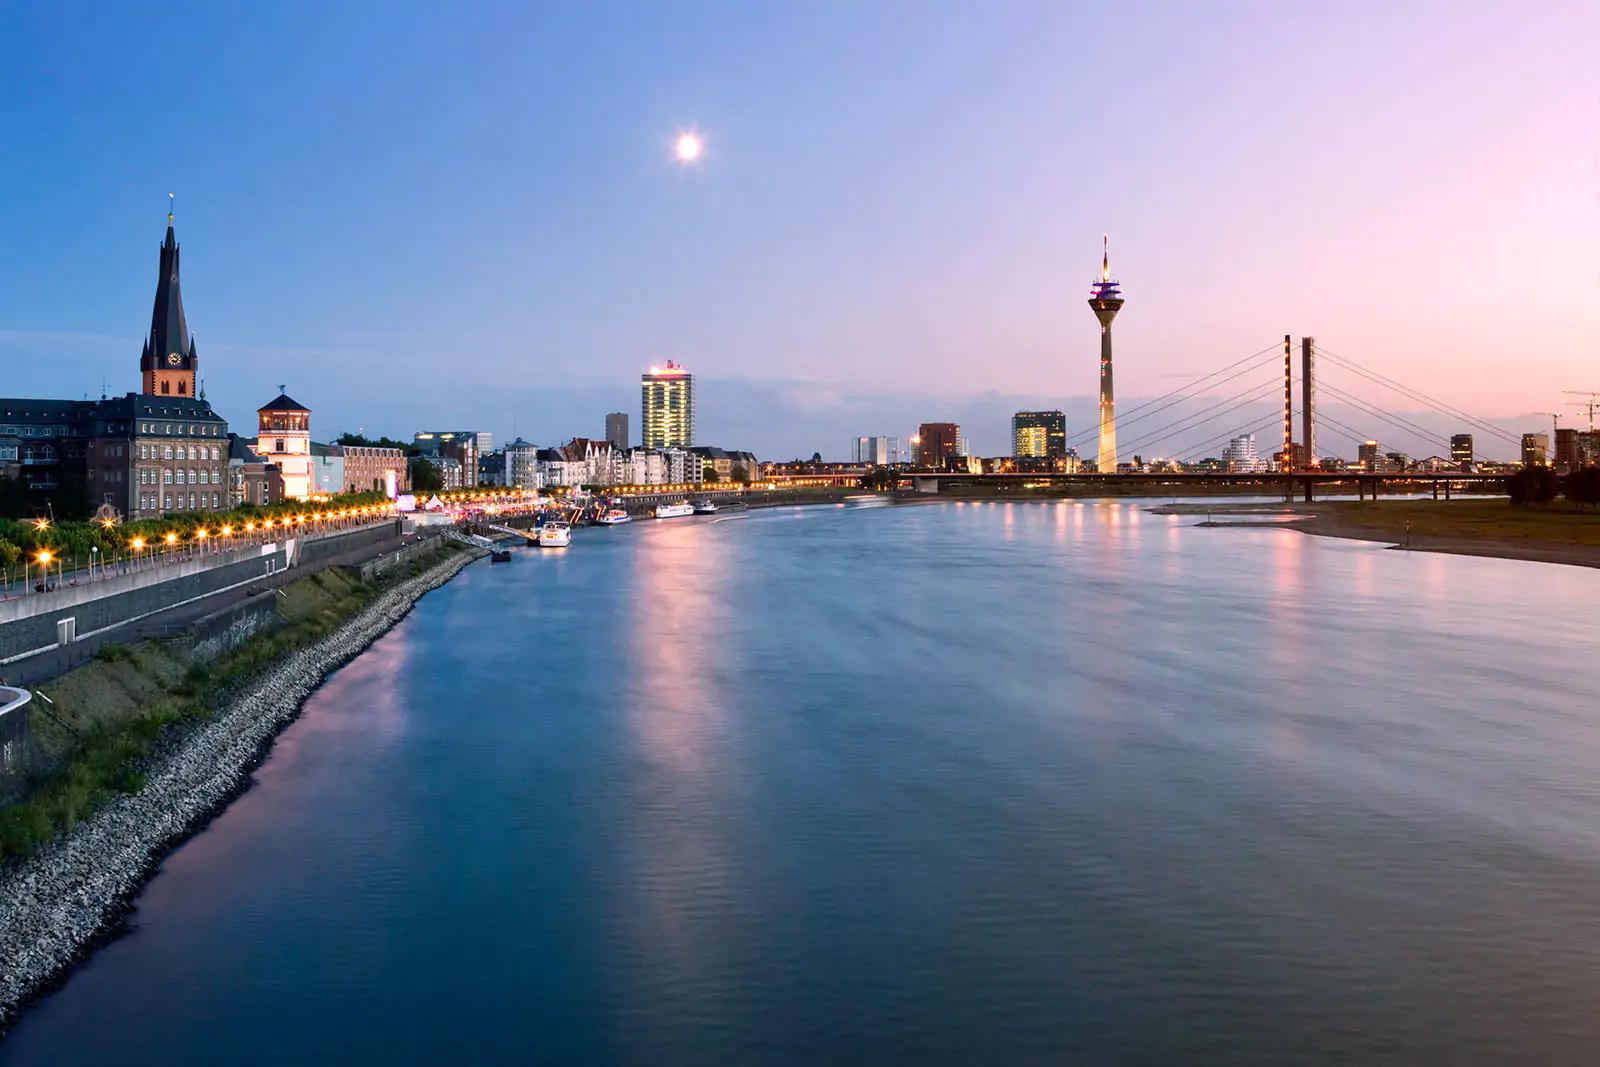 MEDICA 2019 Düsseldorf – November 18- 21